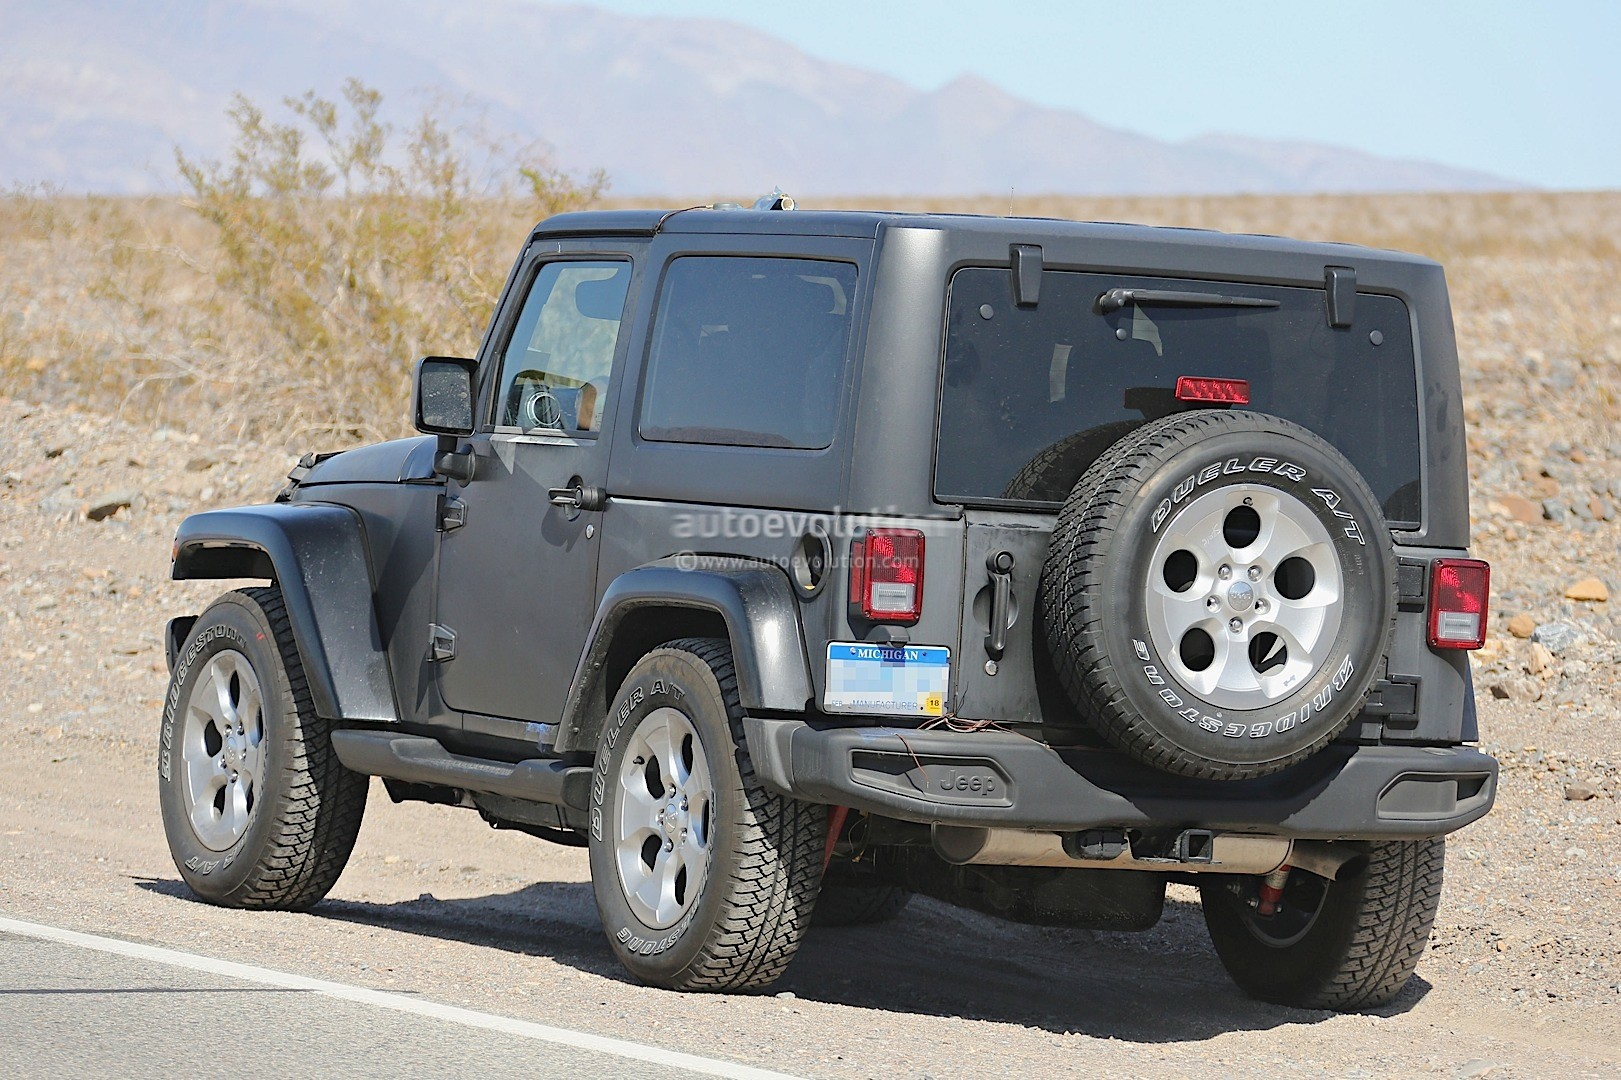 2016 Jeep Renegade Recalls >> UPDATE: 2018 Jeep Wrangler (JL) to Get 2.0 Hurricane Turbo Engine - autoevolution